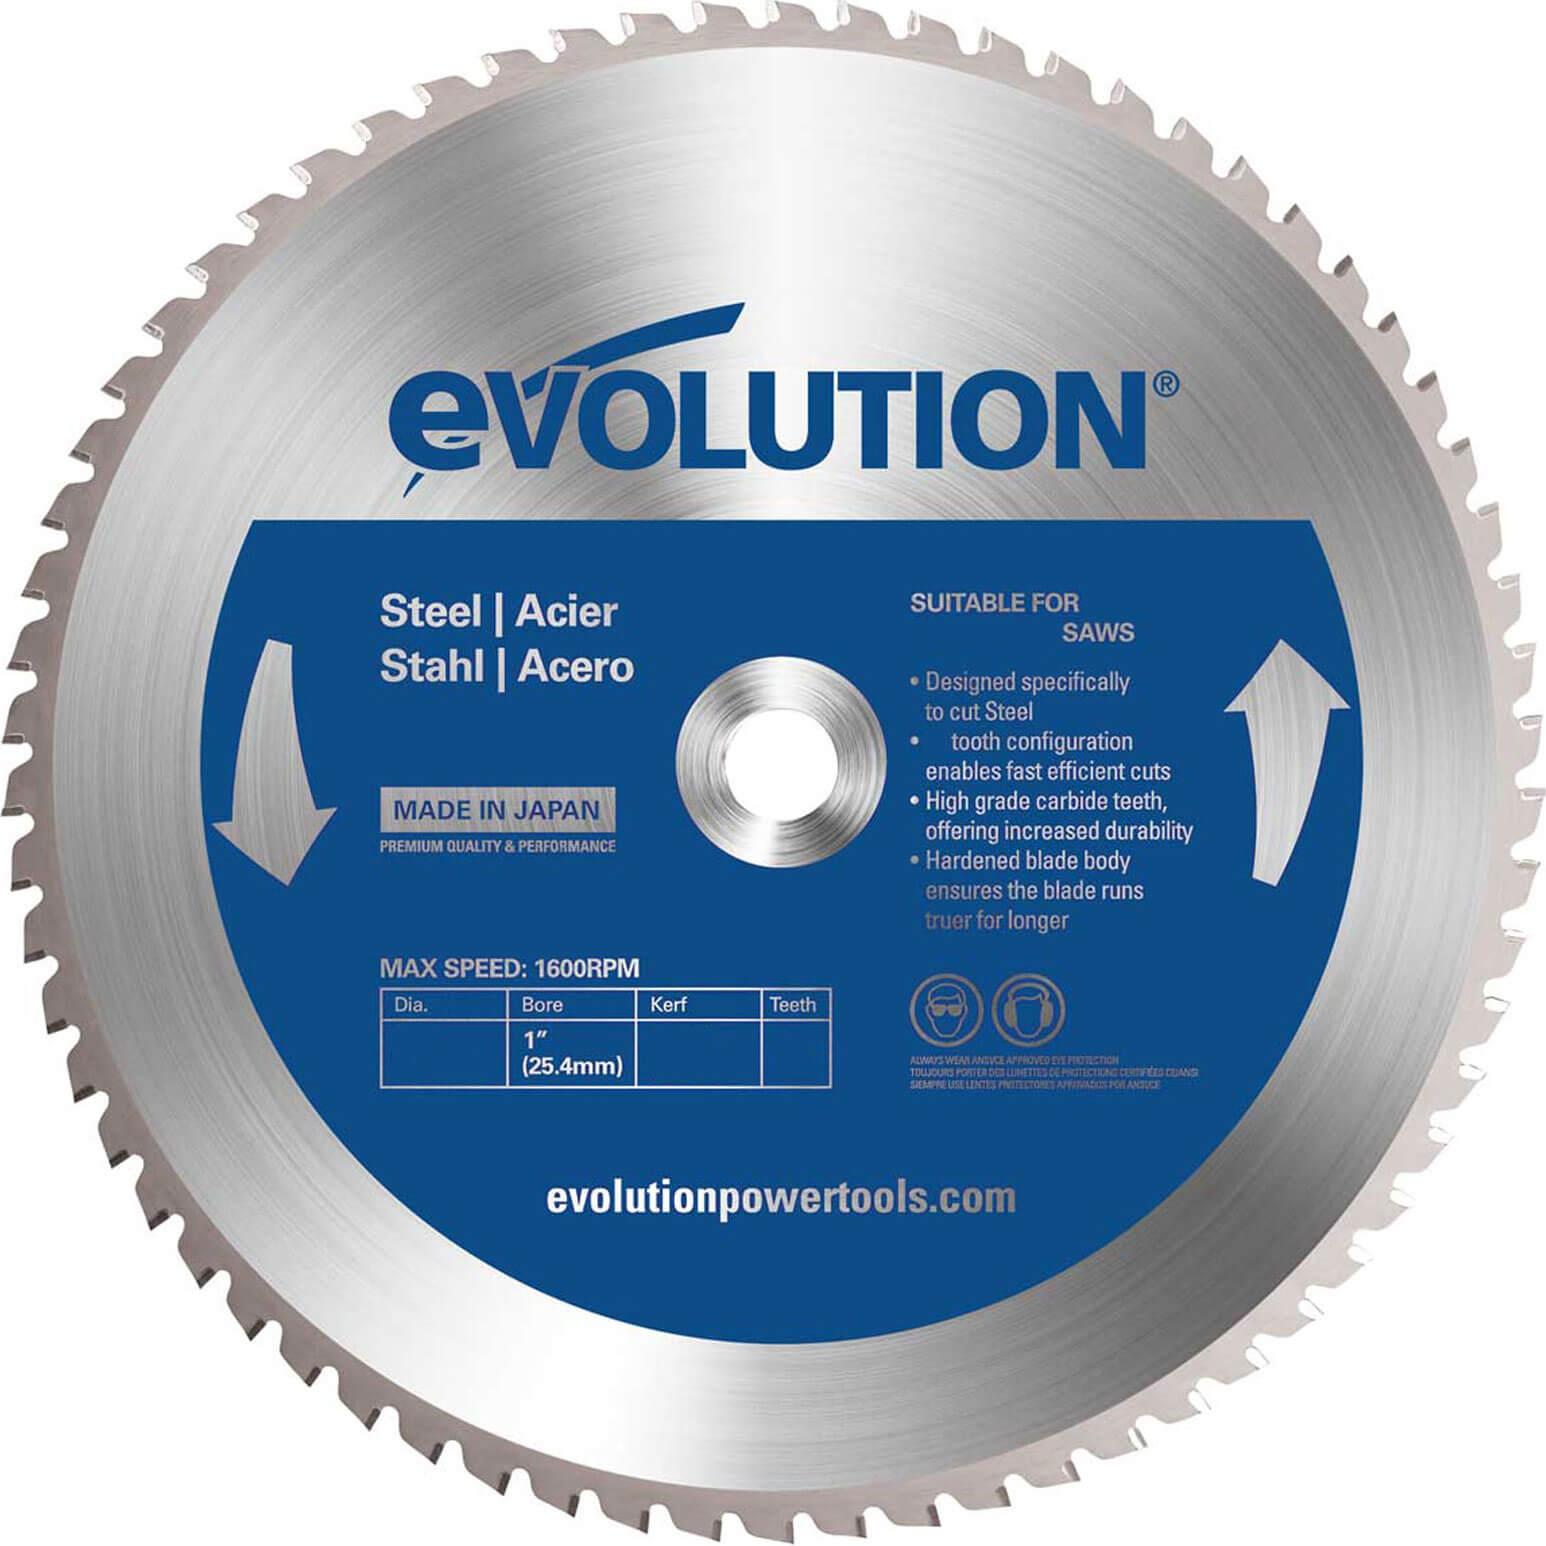 Image of Evolution Mild Steel Cutting Saw Blade 255mm 52T 25.4mm